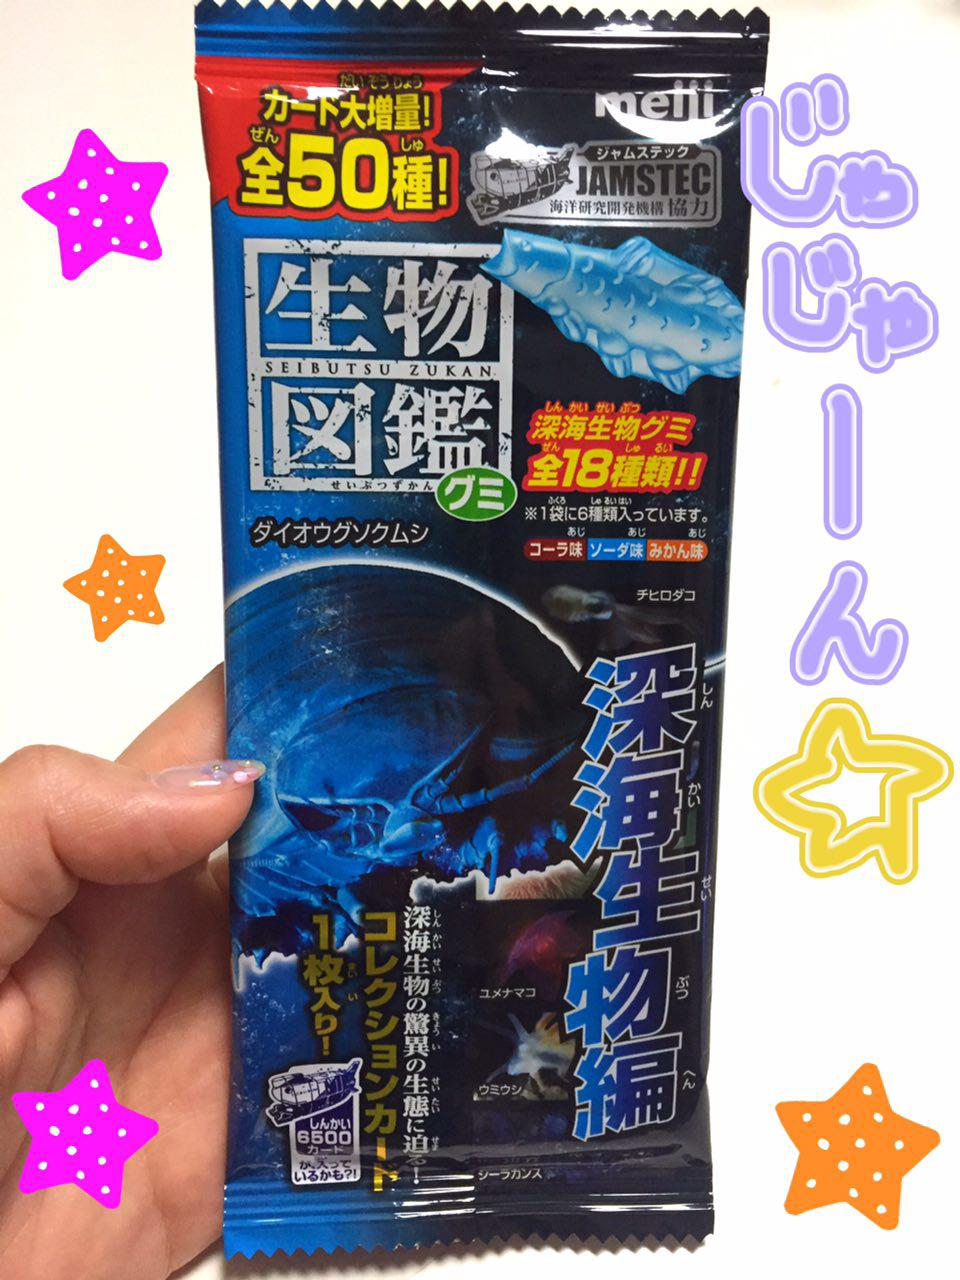 photo_2017-05-08_22-33-23.jpg